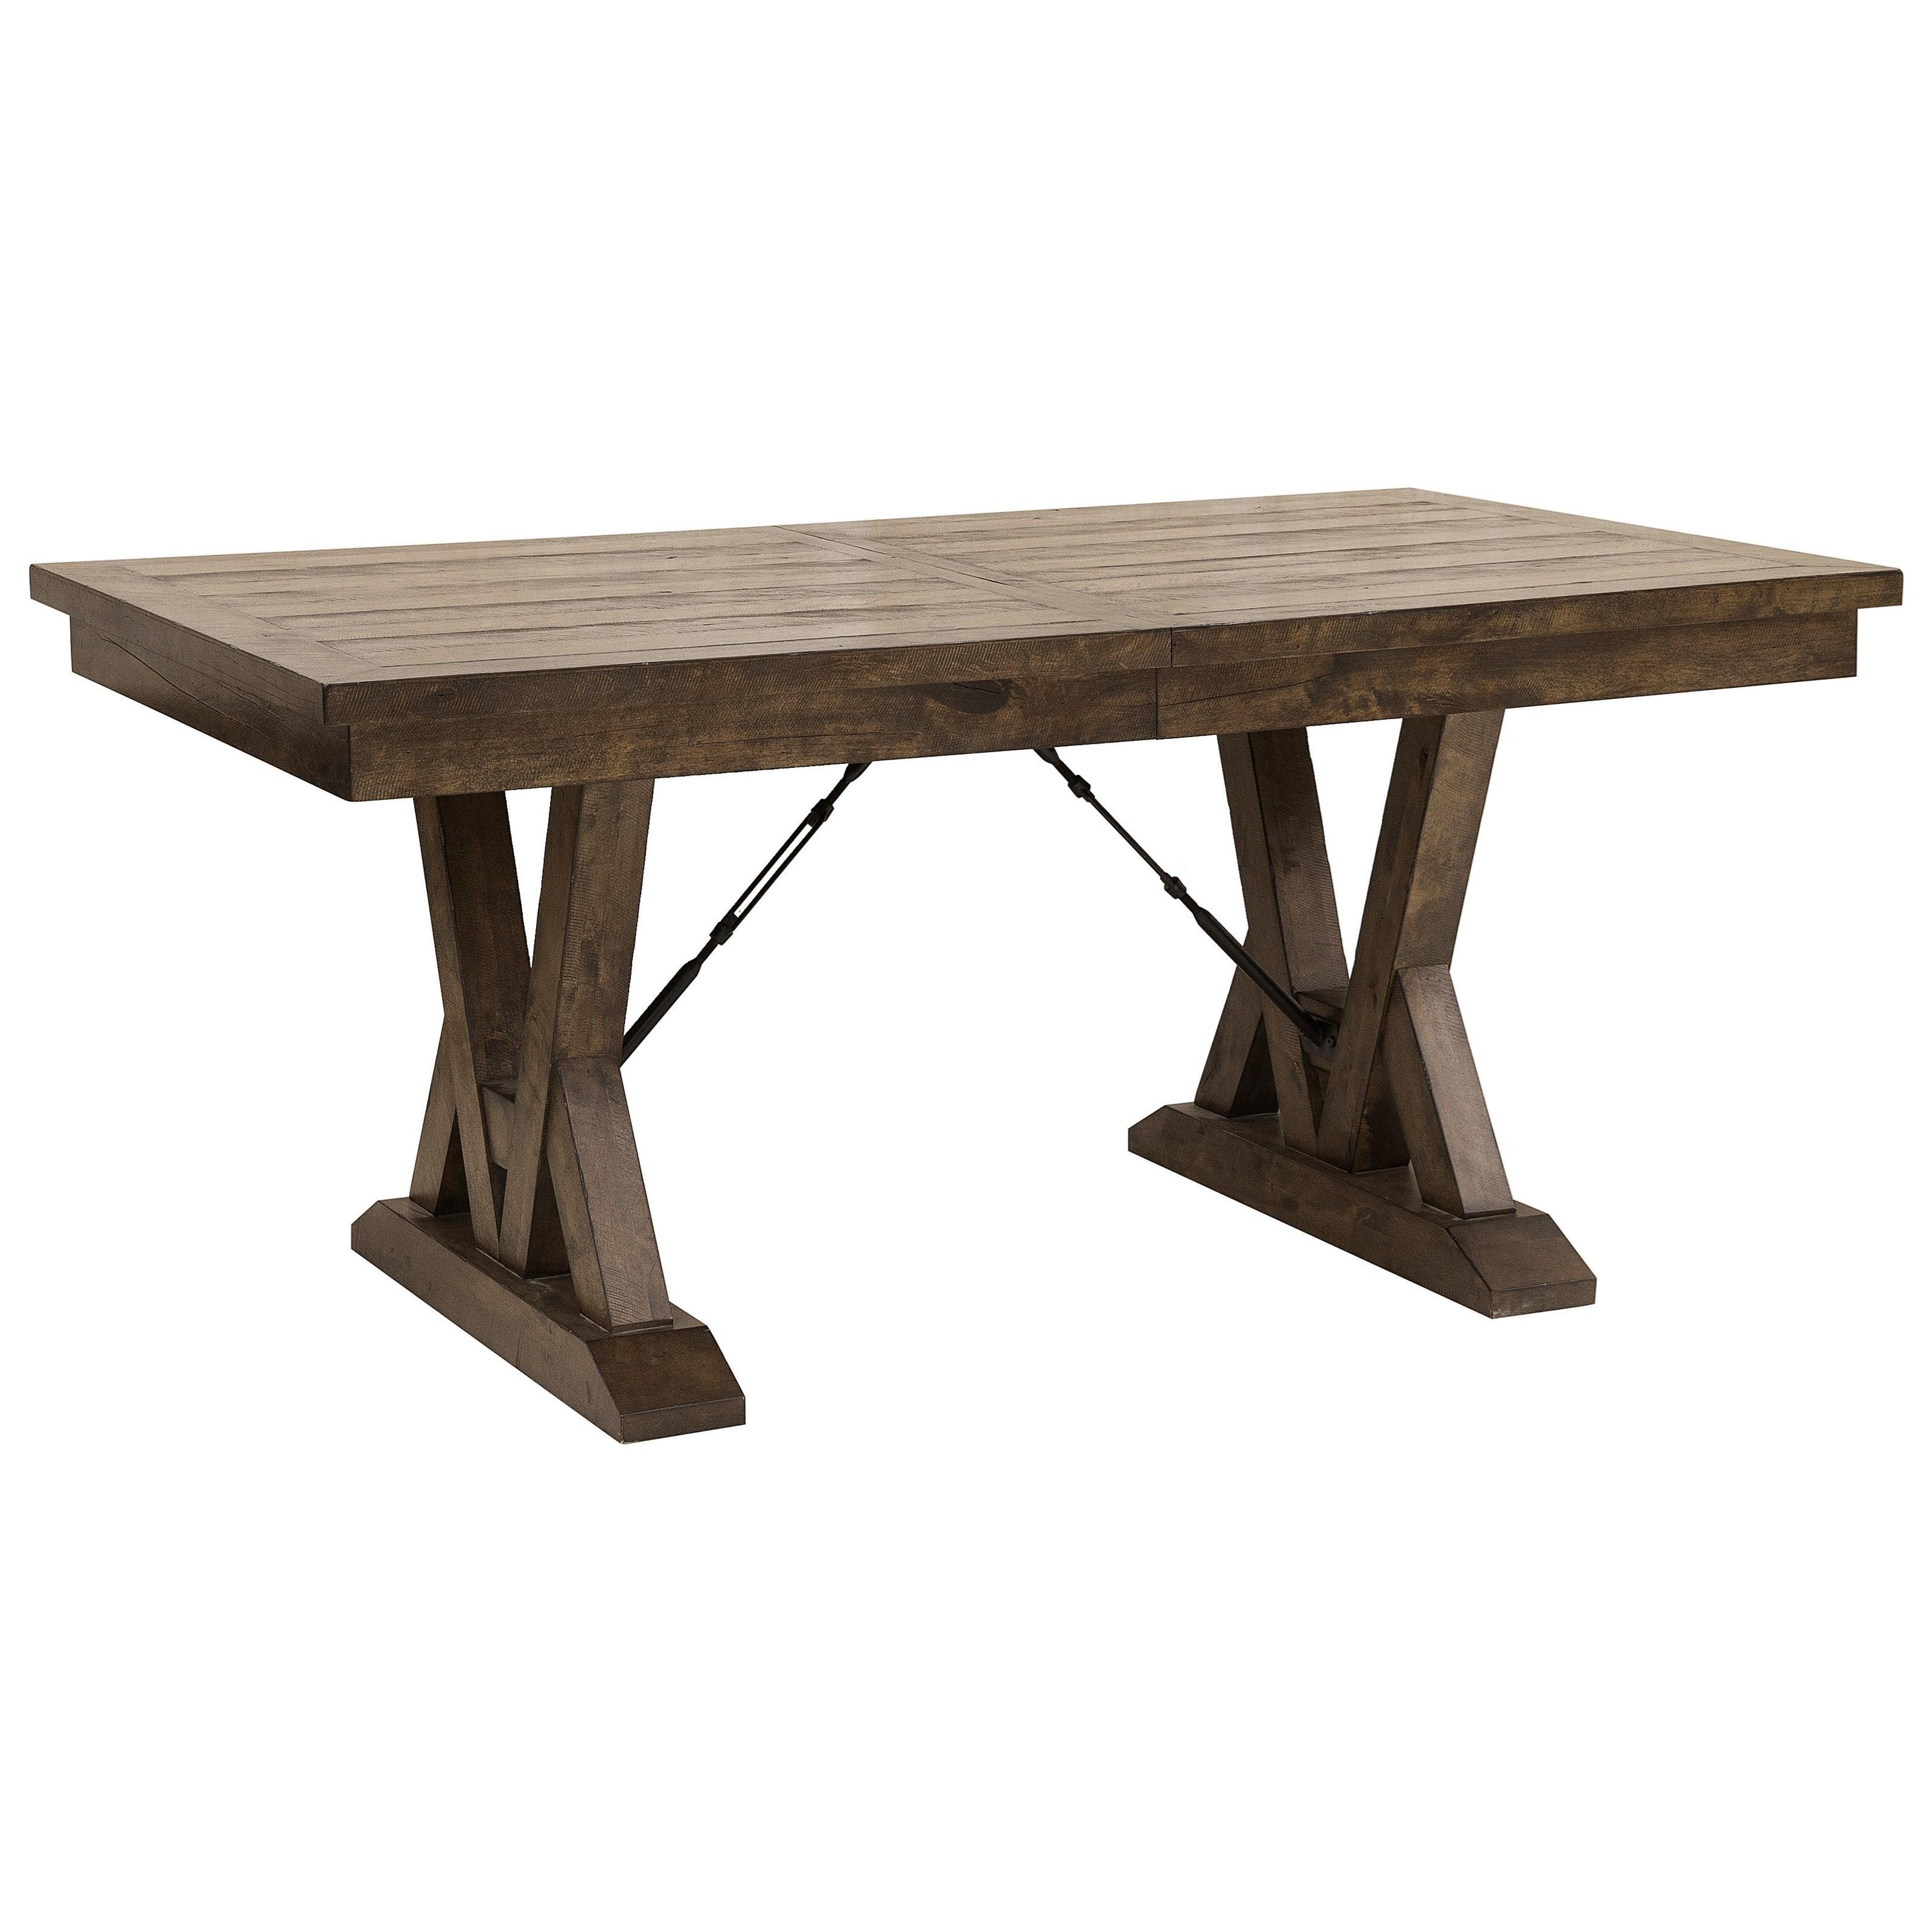 Samuel Lawrence Dakota Rustic Trestle Dining Table With